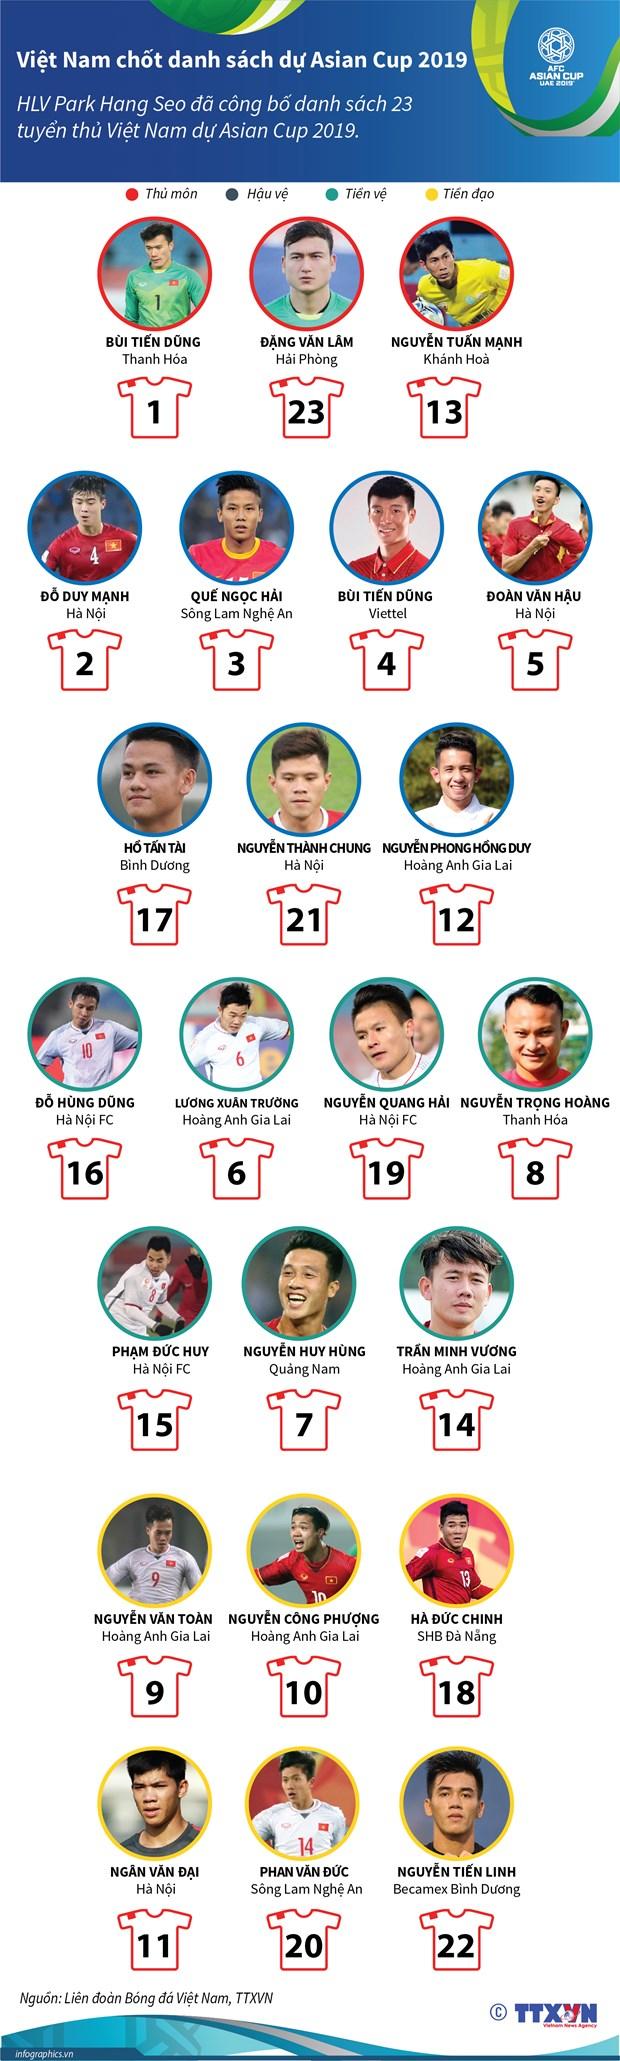 Chi tiet so ao dau cac cau thu Viet Nam tham du Asian Cup 2019 hinh anh 2